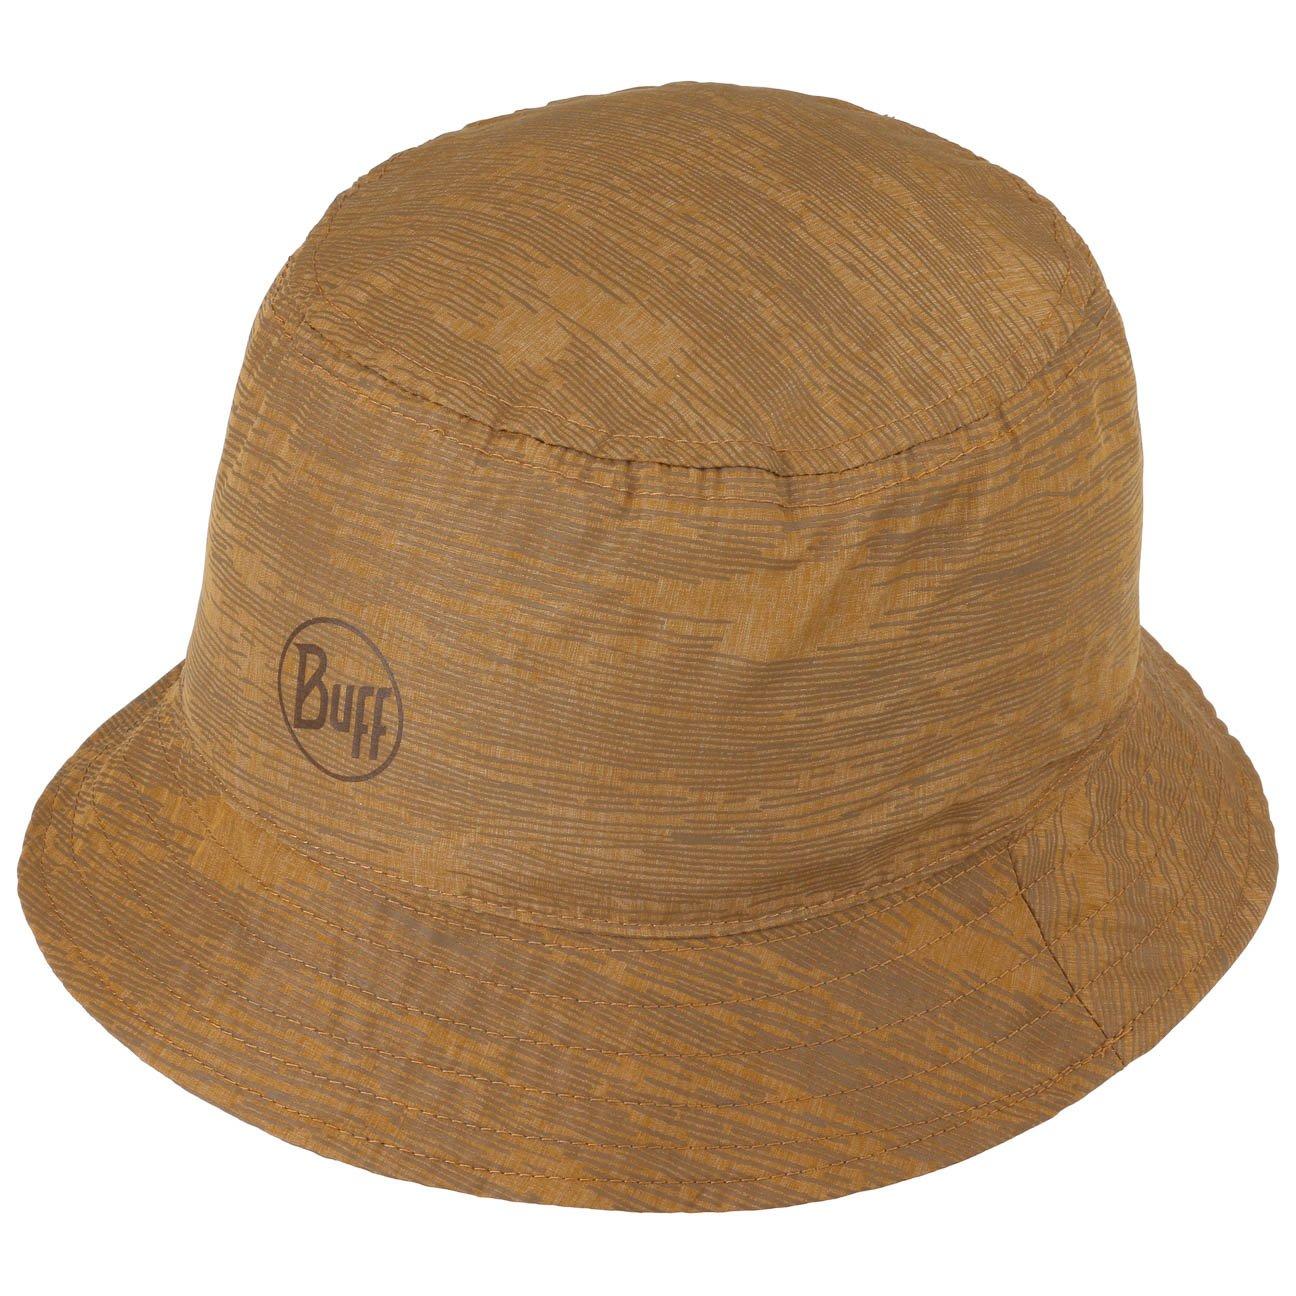 02f2459a21503 Amazon.com  Buff Travel Bucket Landscape Desert-Navy - UV Cap  Clothing